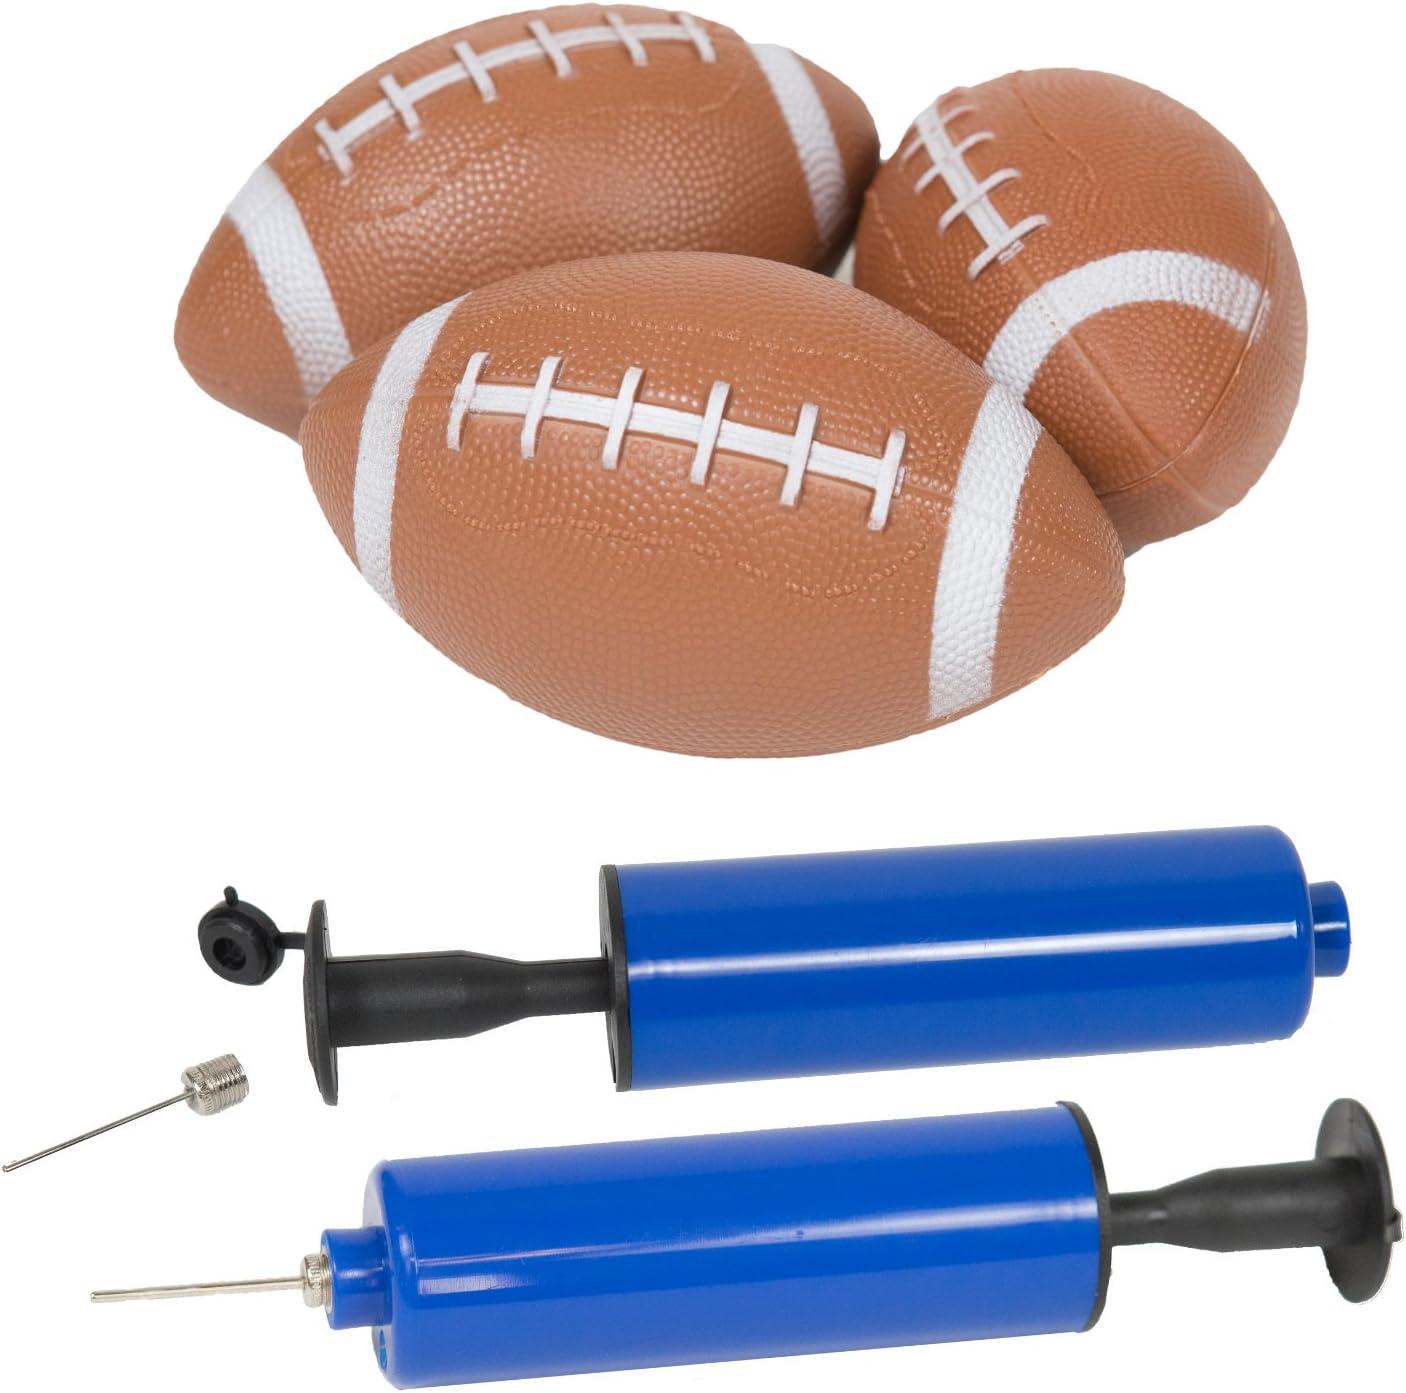 Amazon.com: ImpiriLux - Juego de fútbol inflable con 3 mini ...